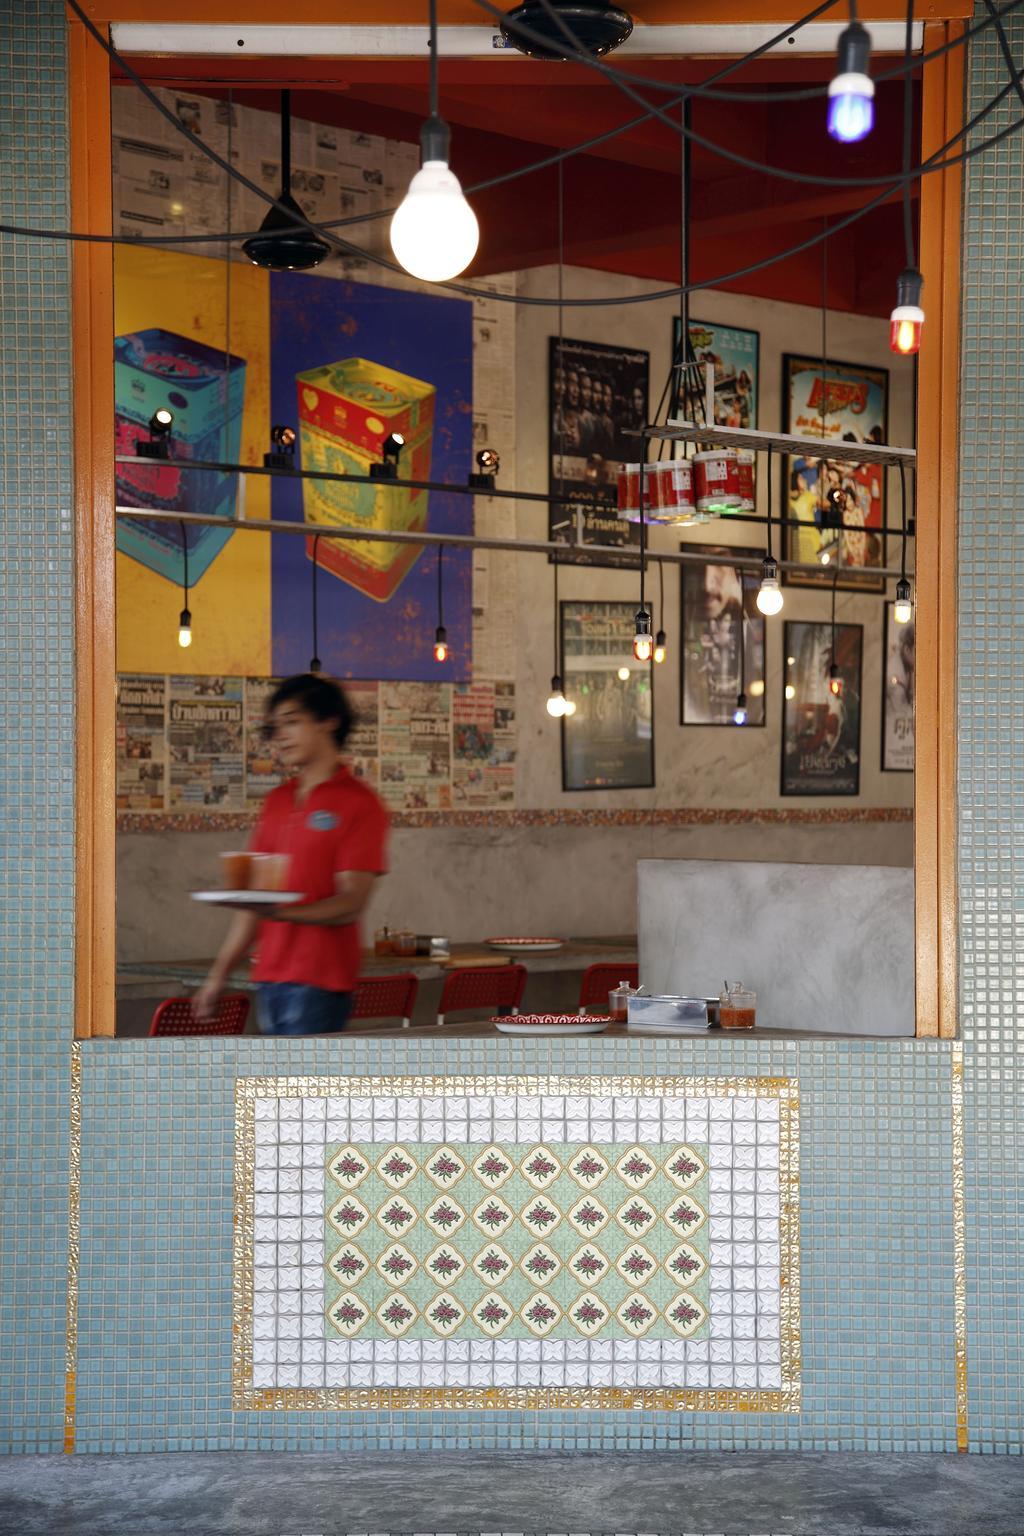 Tom Yum Kung Fu - Serangoon Garden, Commercial, Interior Designer, Free Space Intent, Vintage, Mosaic Tiles, Wall Art, Painting, Hanging Light, Exposed Lightbulb, Human, People, Person